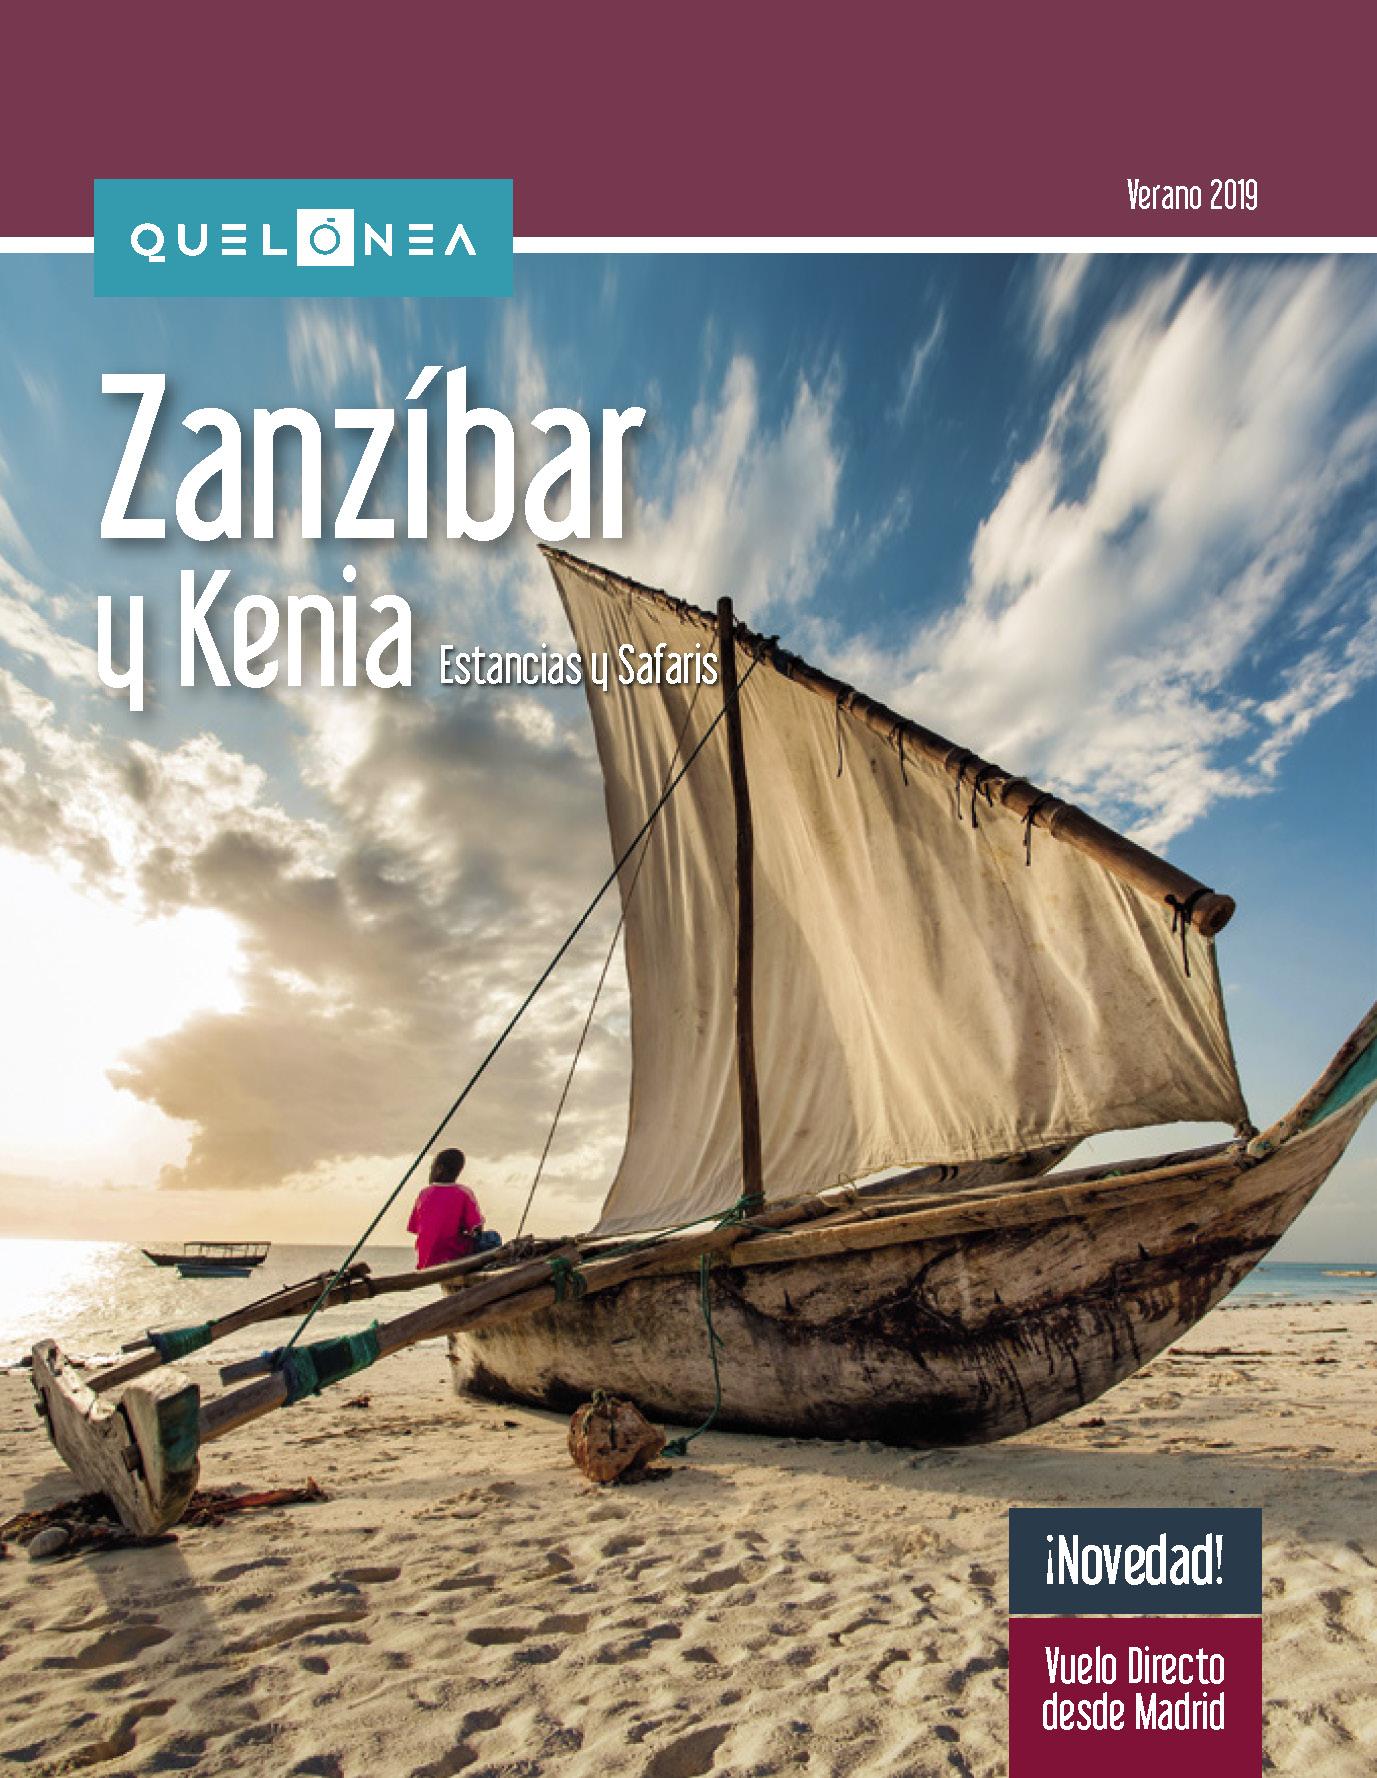 Catalogo Quelonea Zanzibar Verano 2019